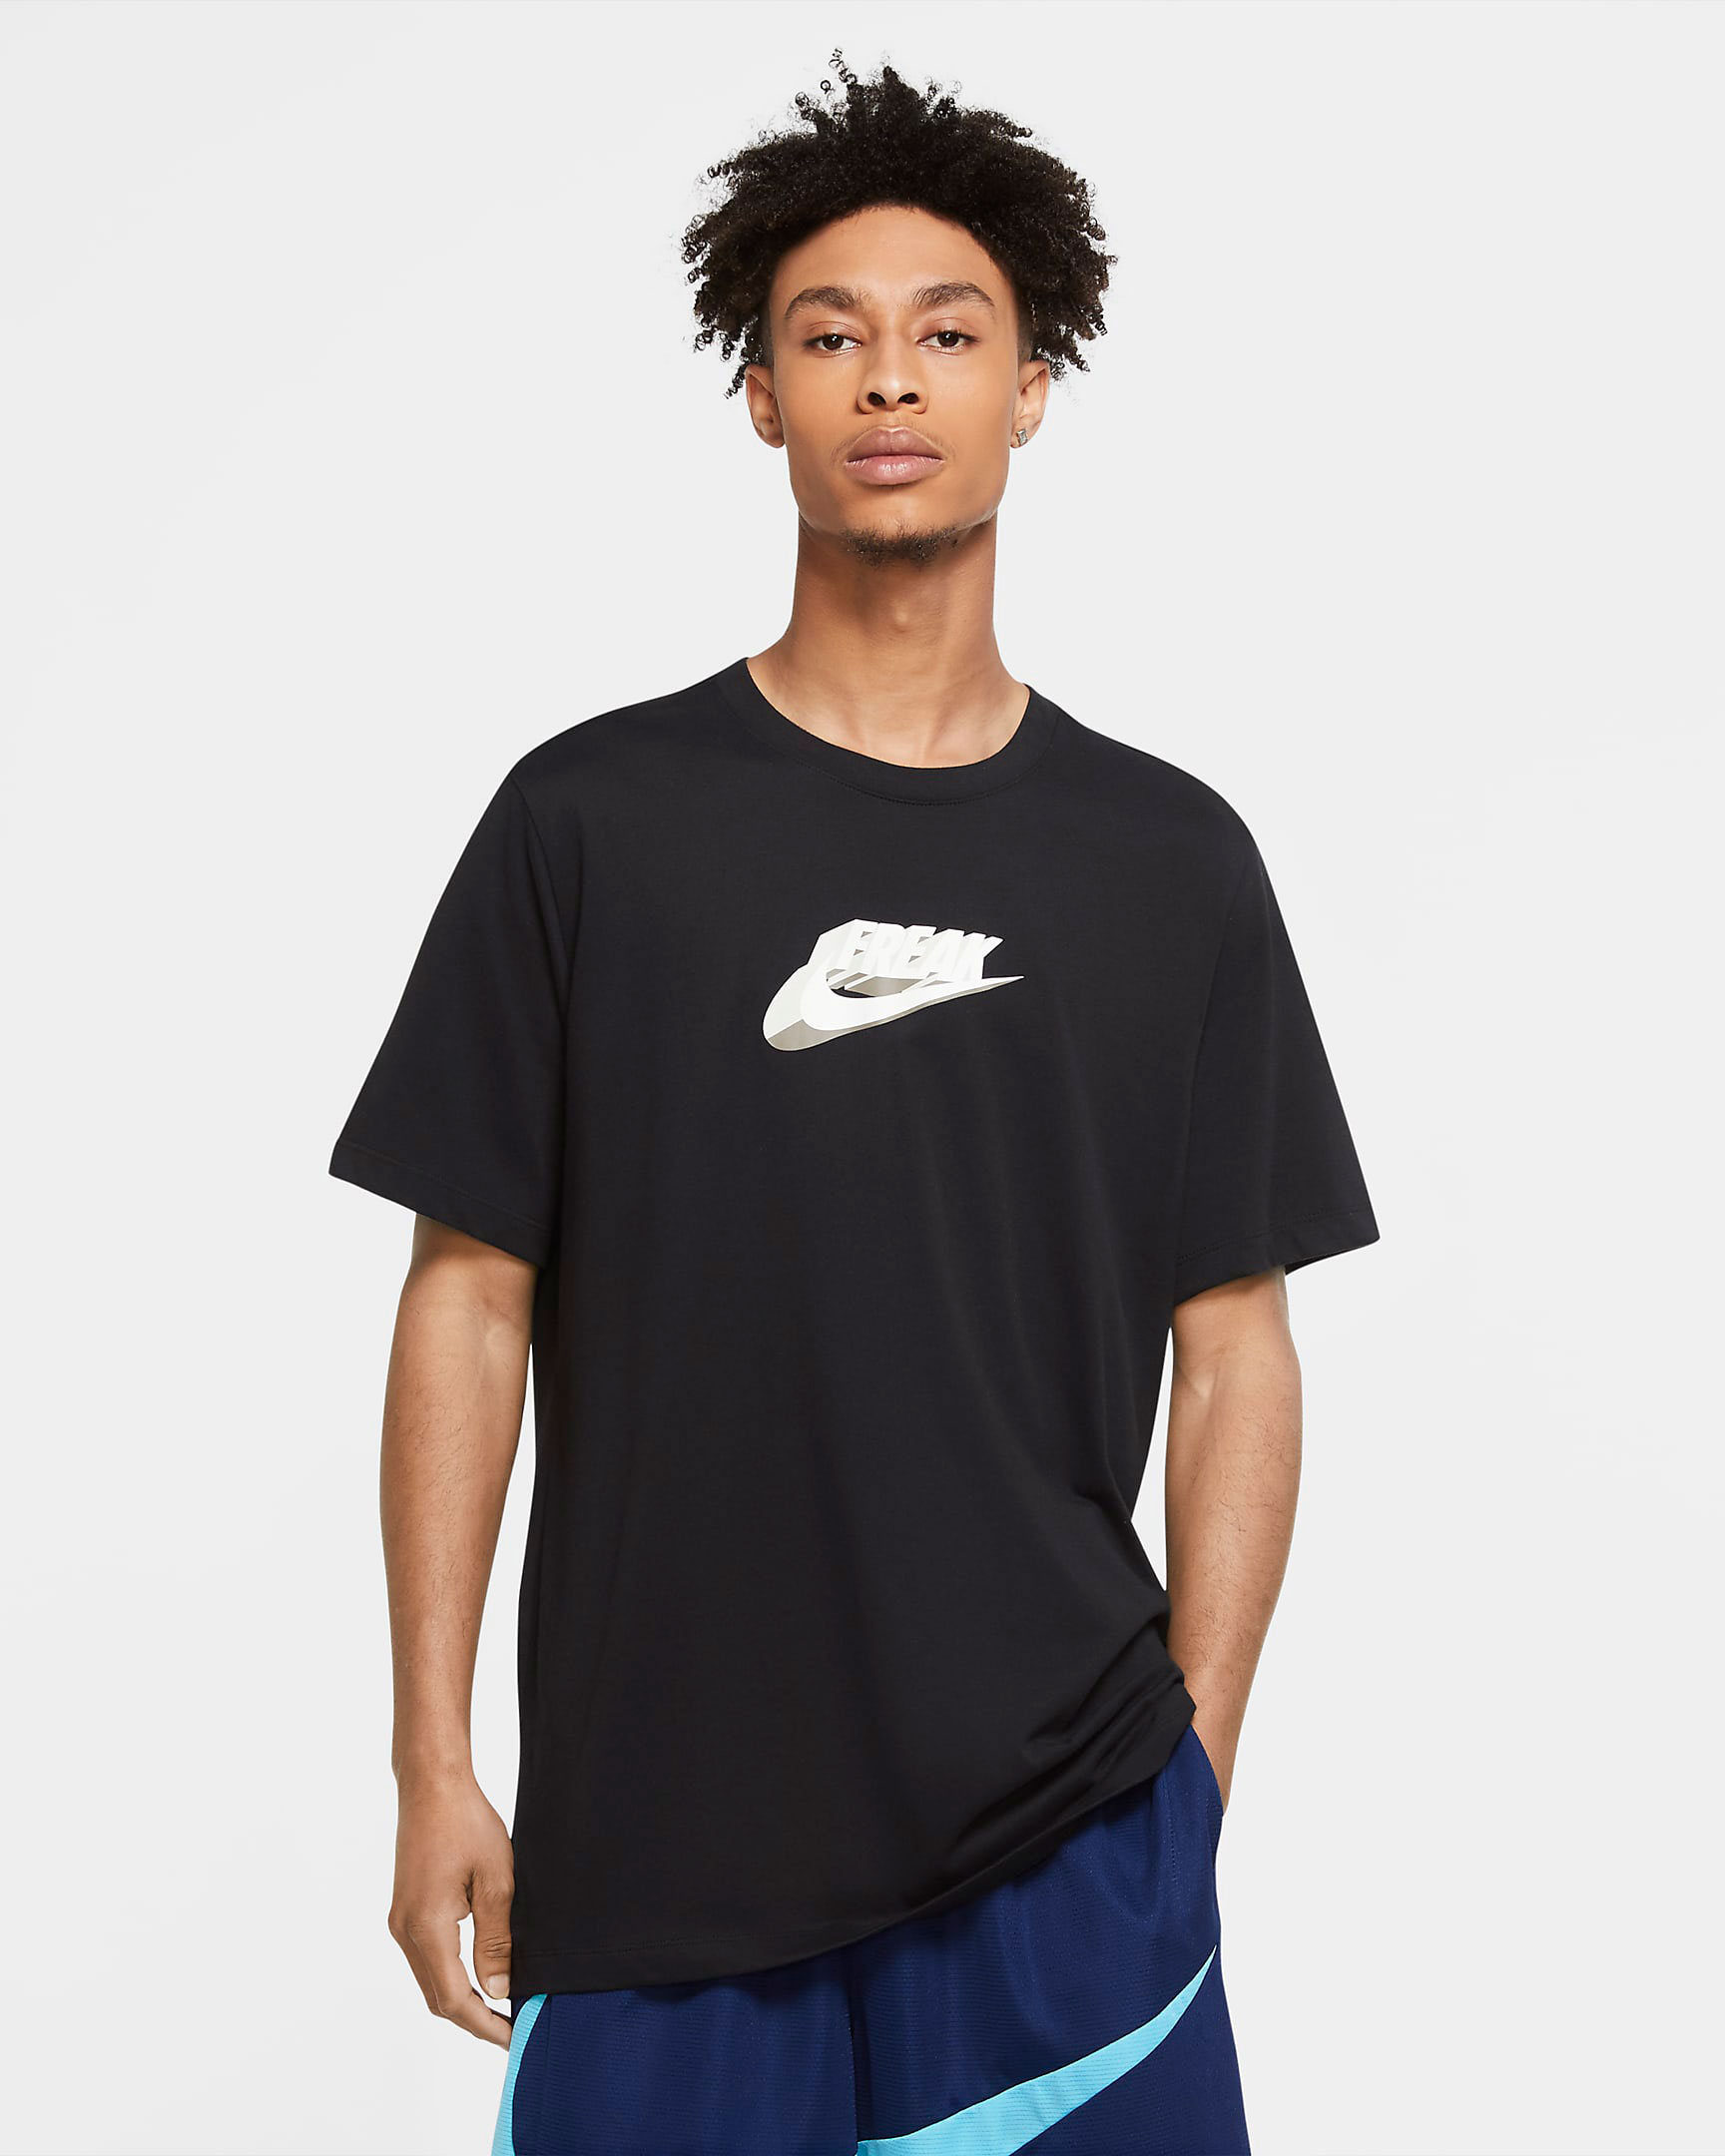 nike-zoom-freak-2-black-white-shirt